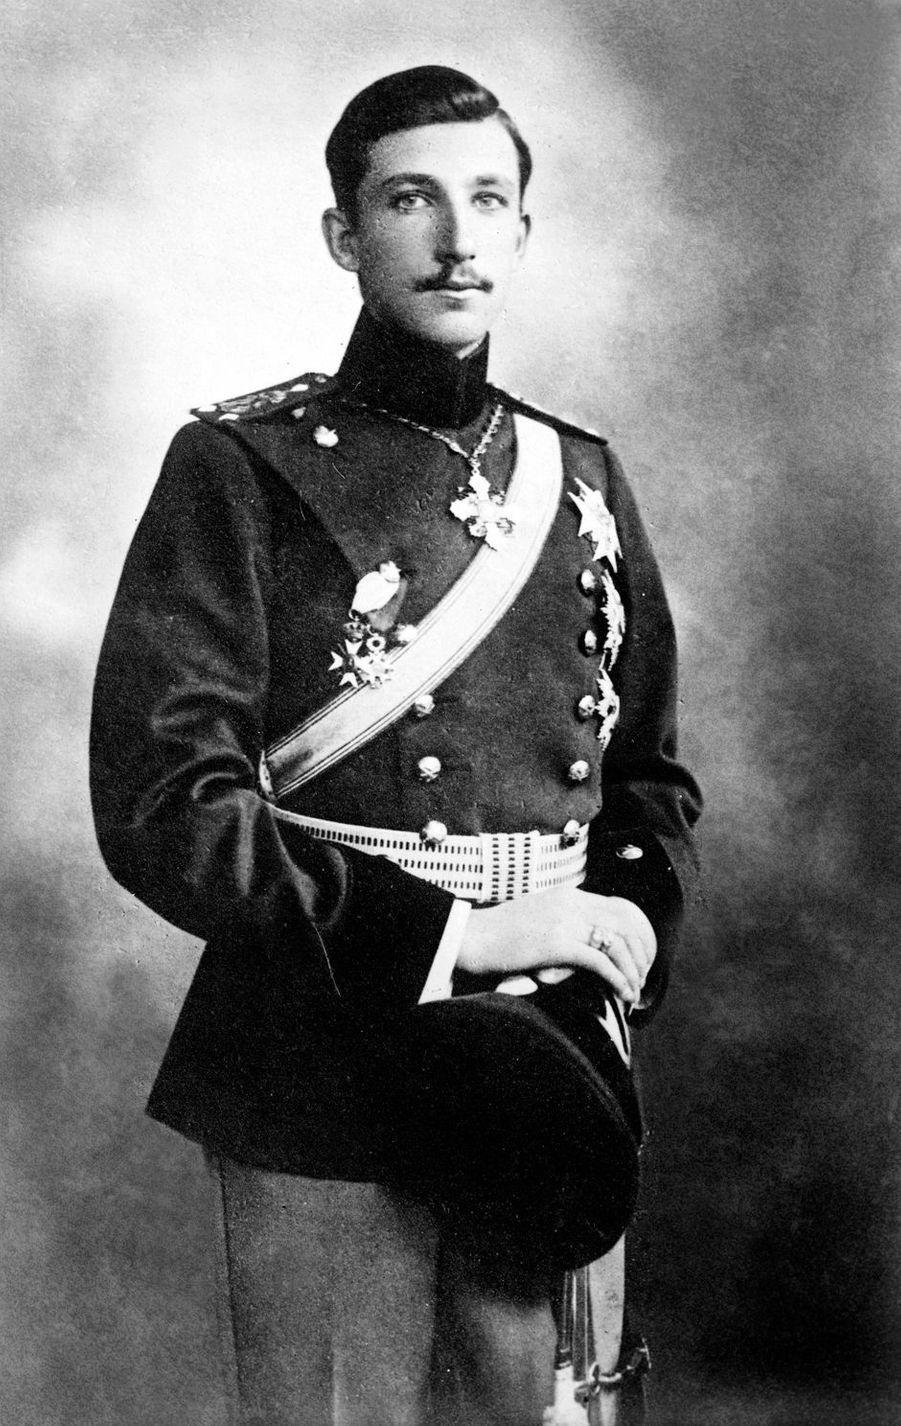 Le roi des Bulgares Boris III (ici vers 1920) régna de 1918 à 1943